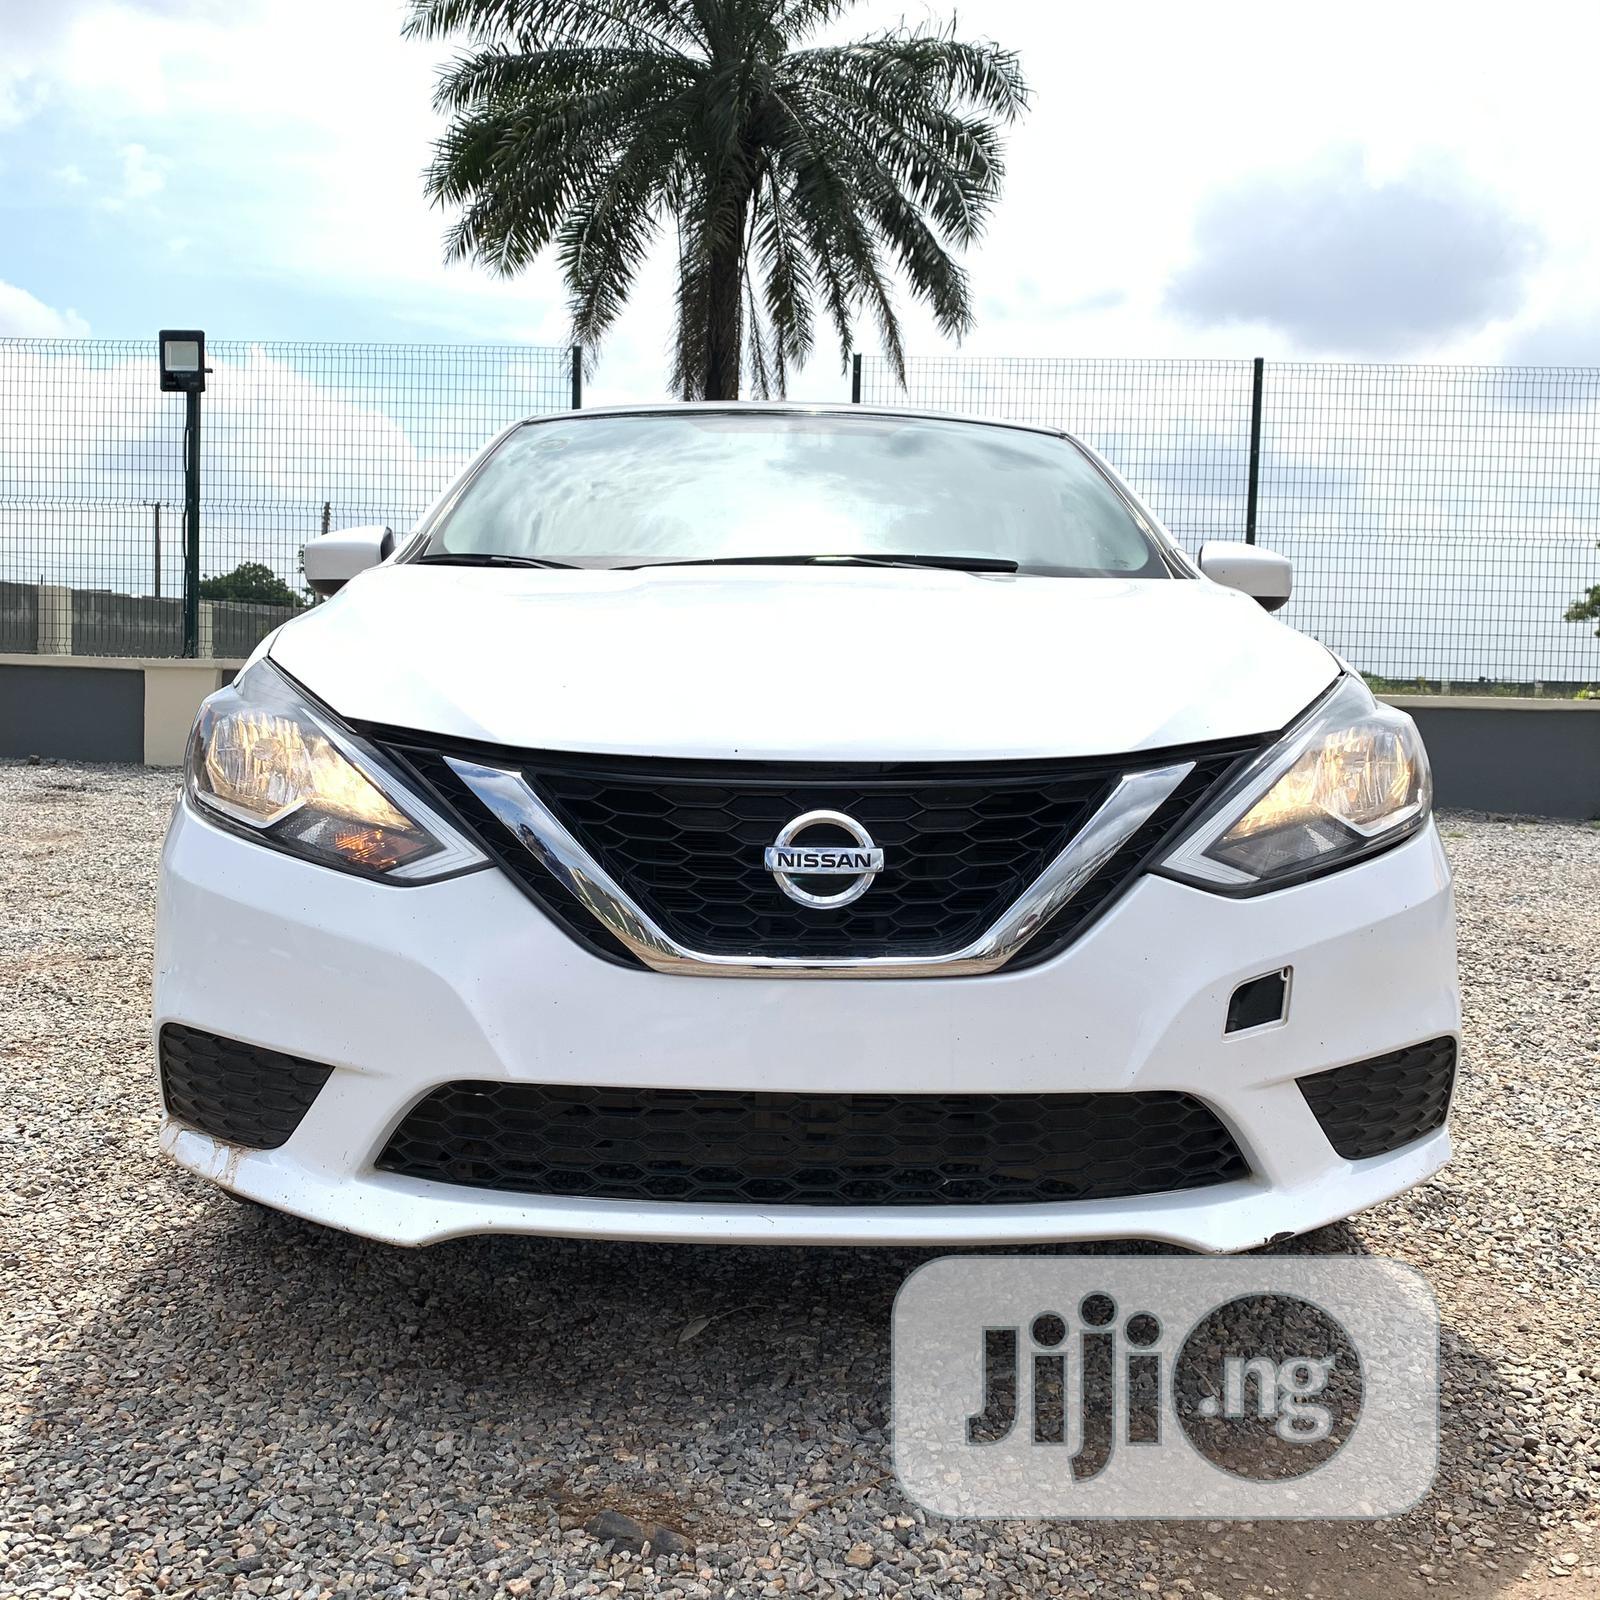 Archive: Nissan Sentra 2016 White